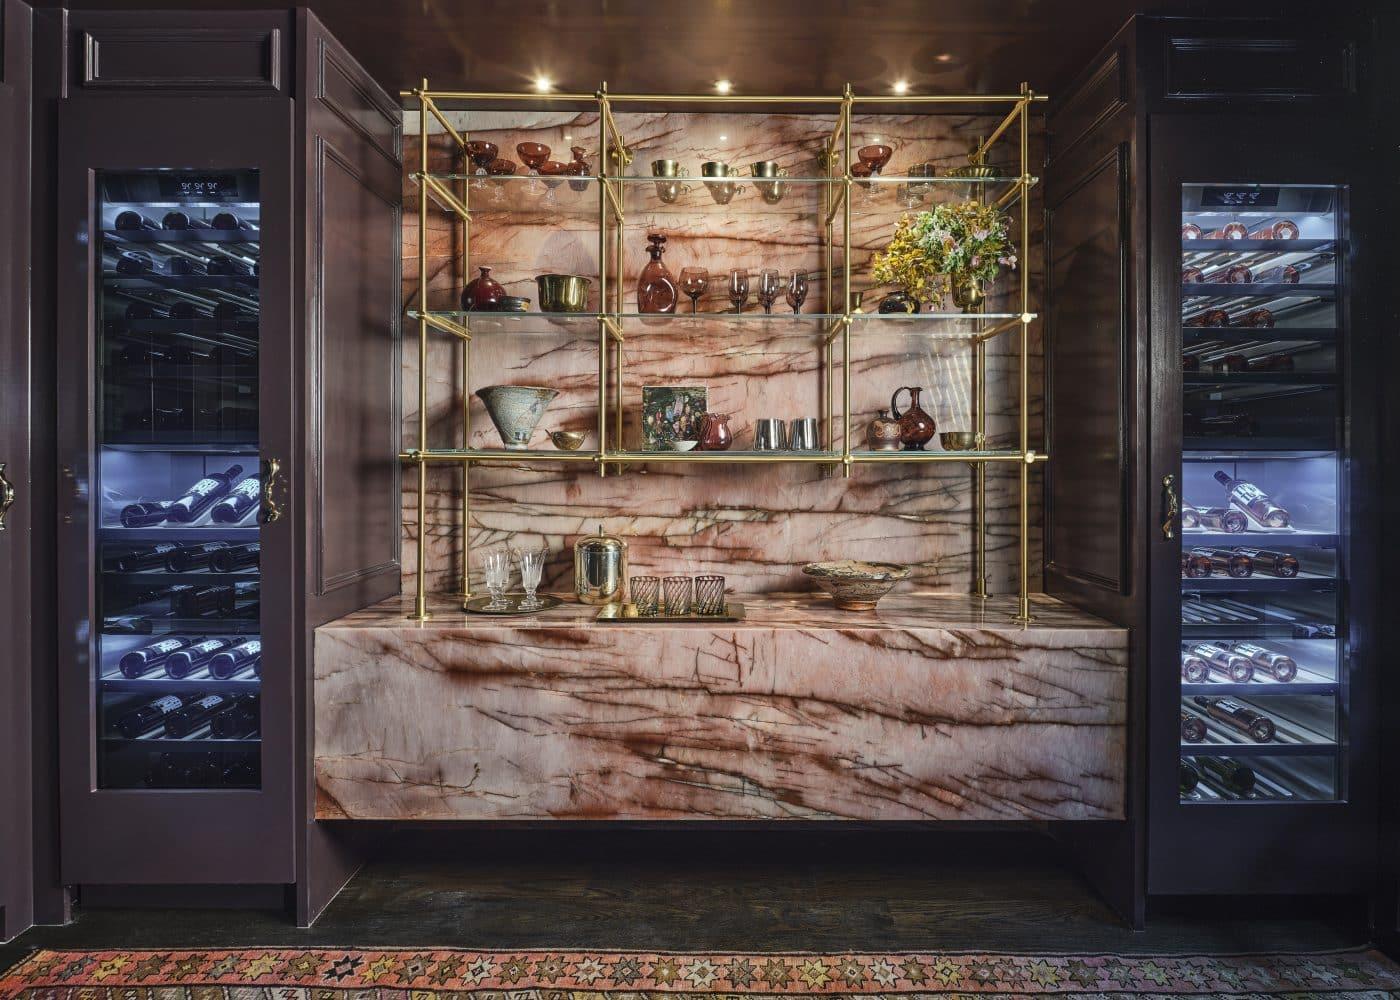 Wine cellar designed by Liz McPhall